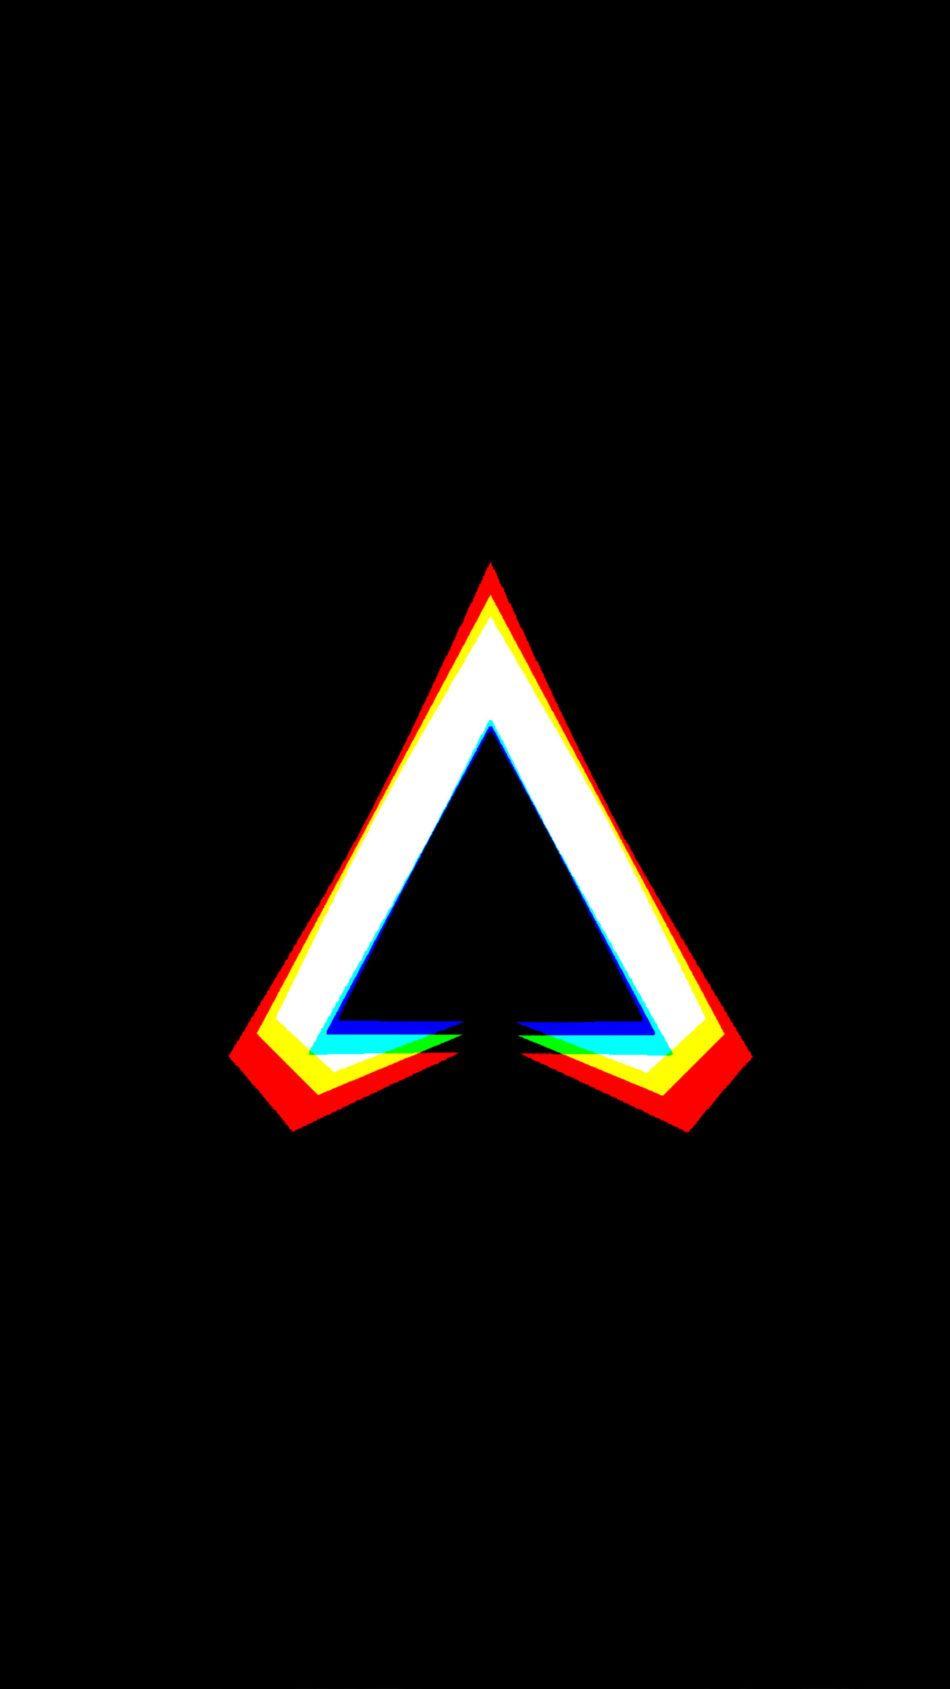 Apex Legends Logo Dark Background 4k Ultra Hd Mobile Wallpaper Dark Backgrounds Logo Wallpaper Hd Apex Logo